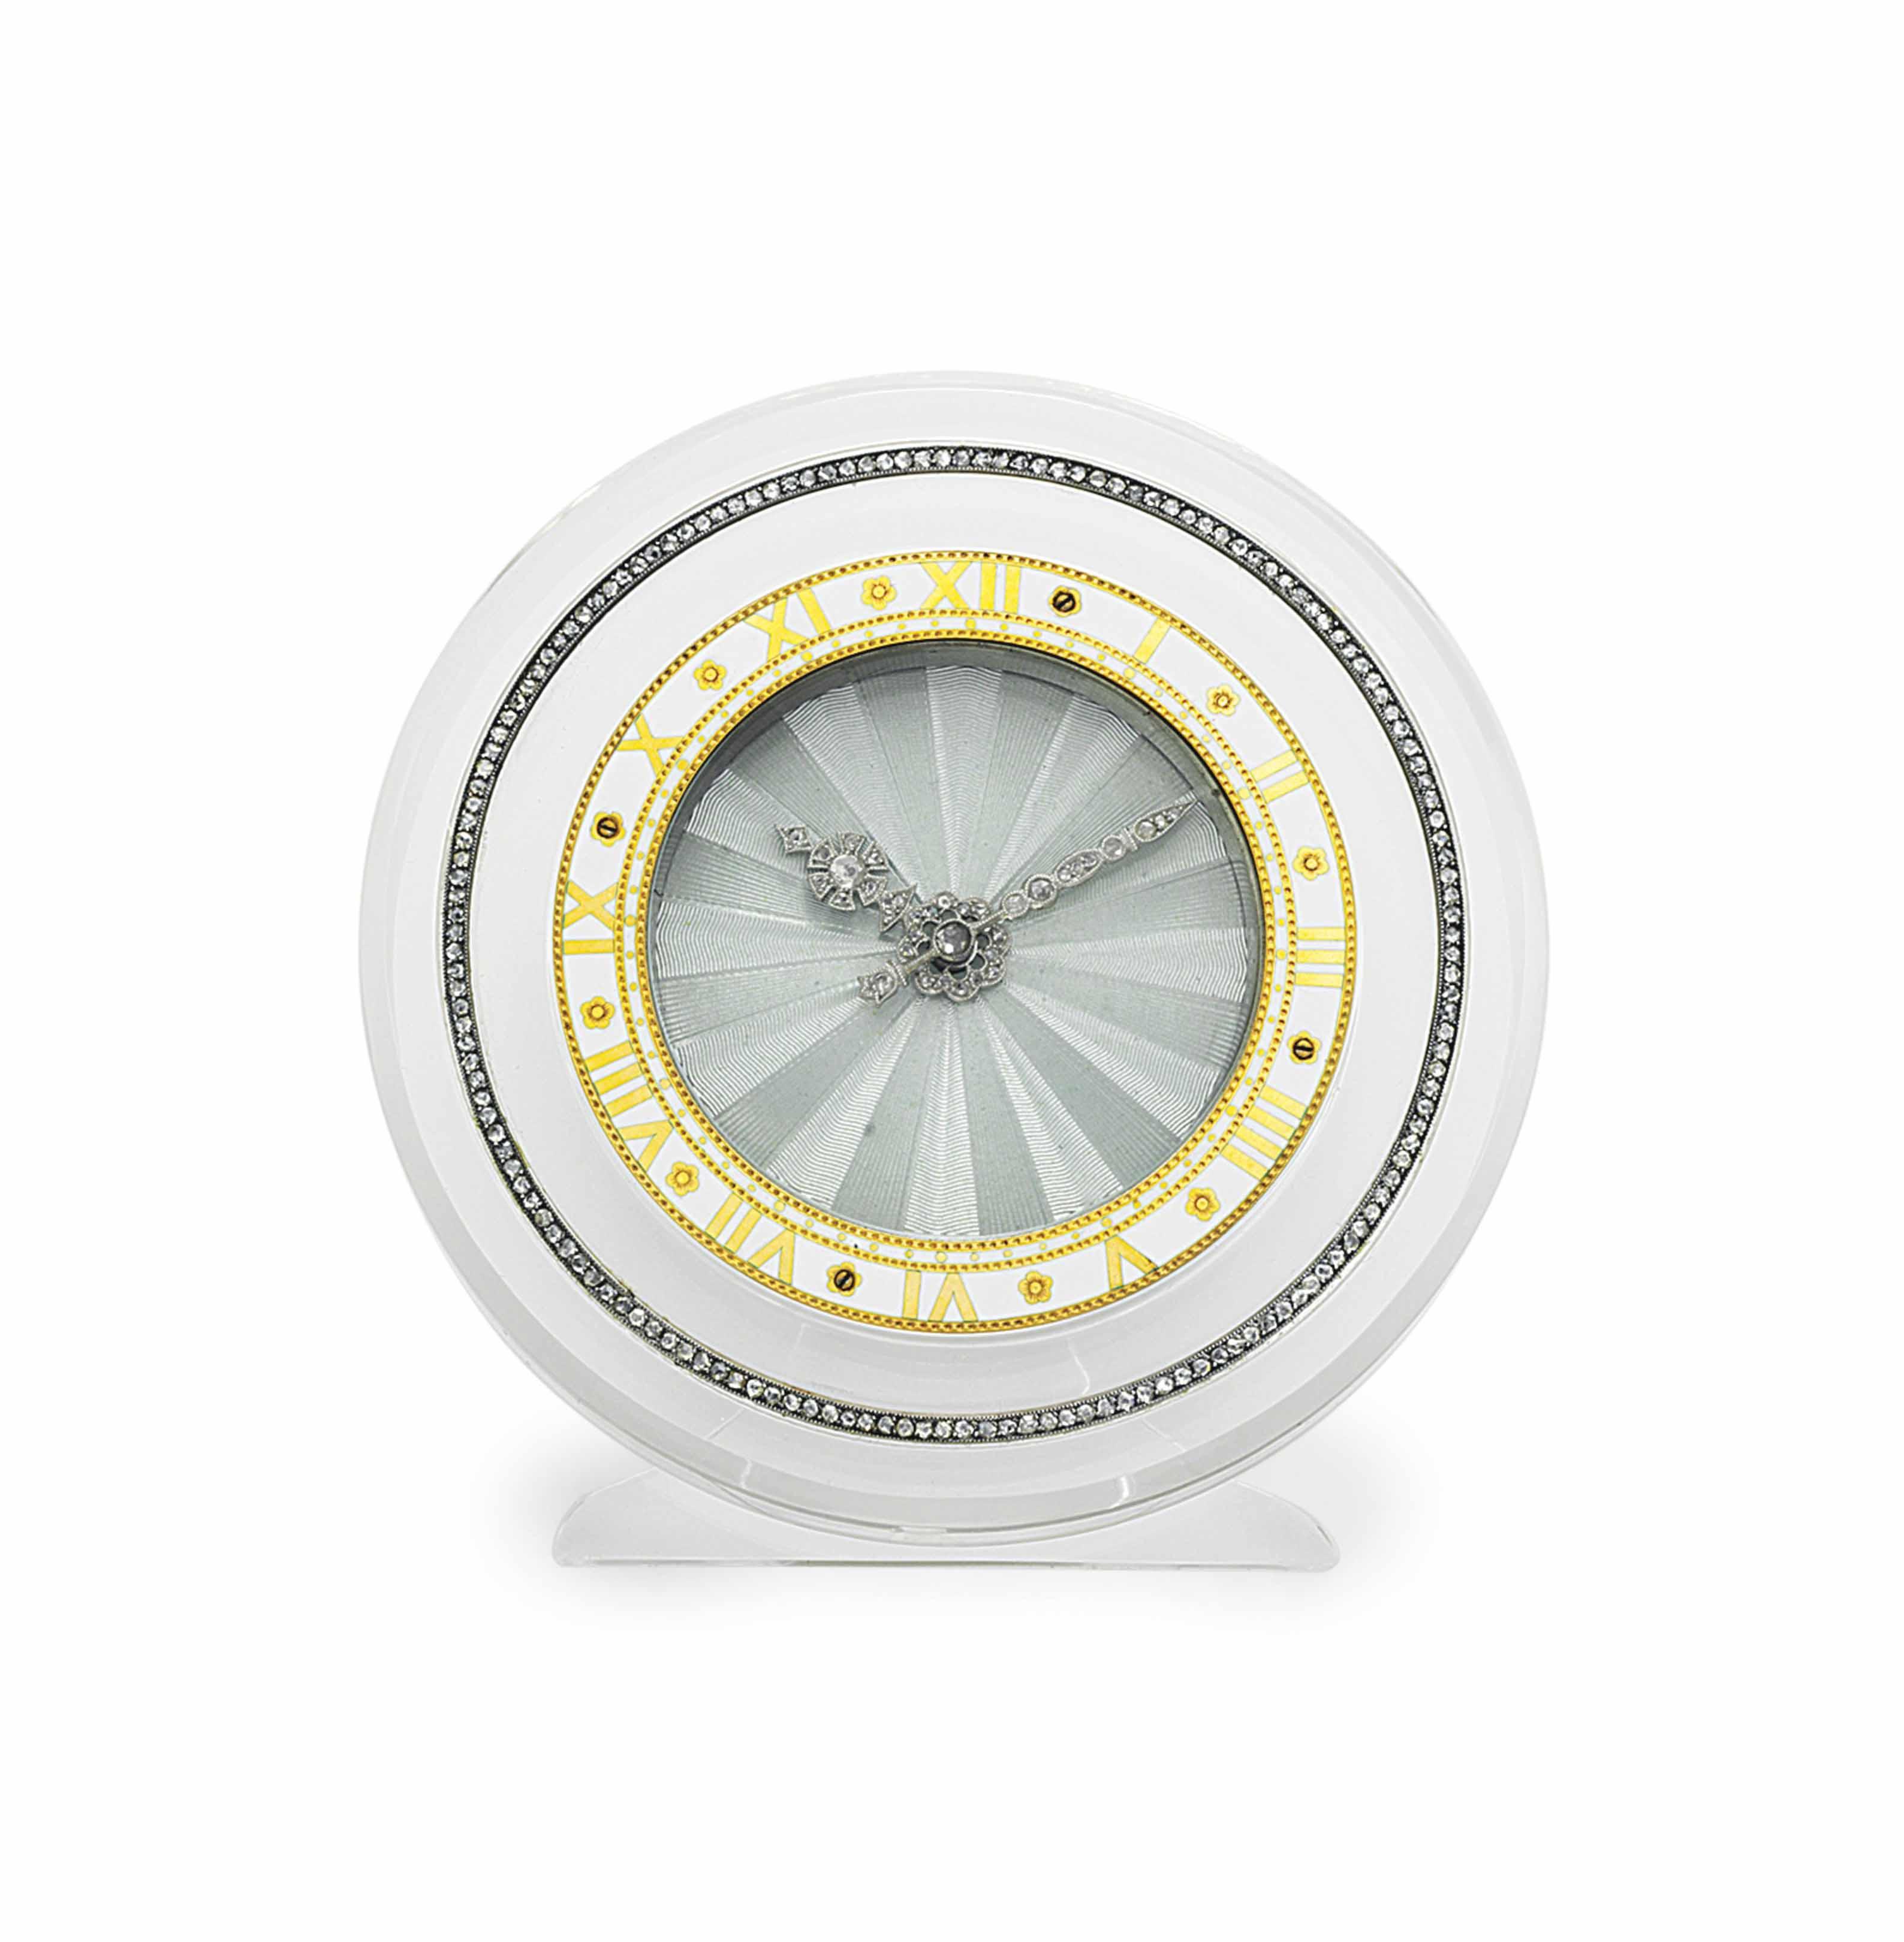 AN ART DECO DIAMOND AND ENAMEL DESK CLOCK, BY CARTIER